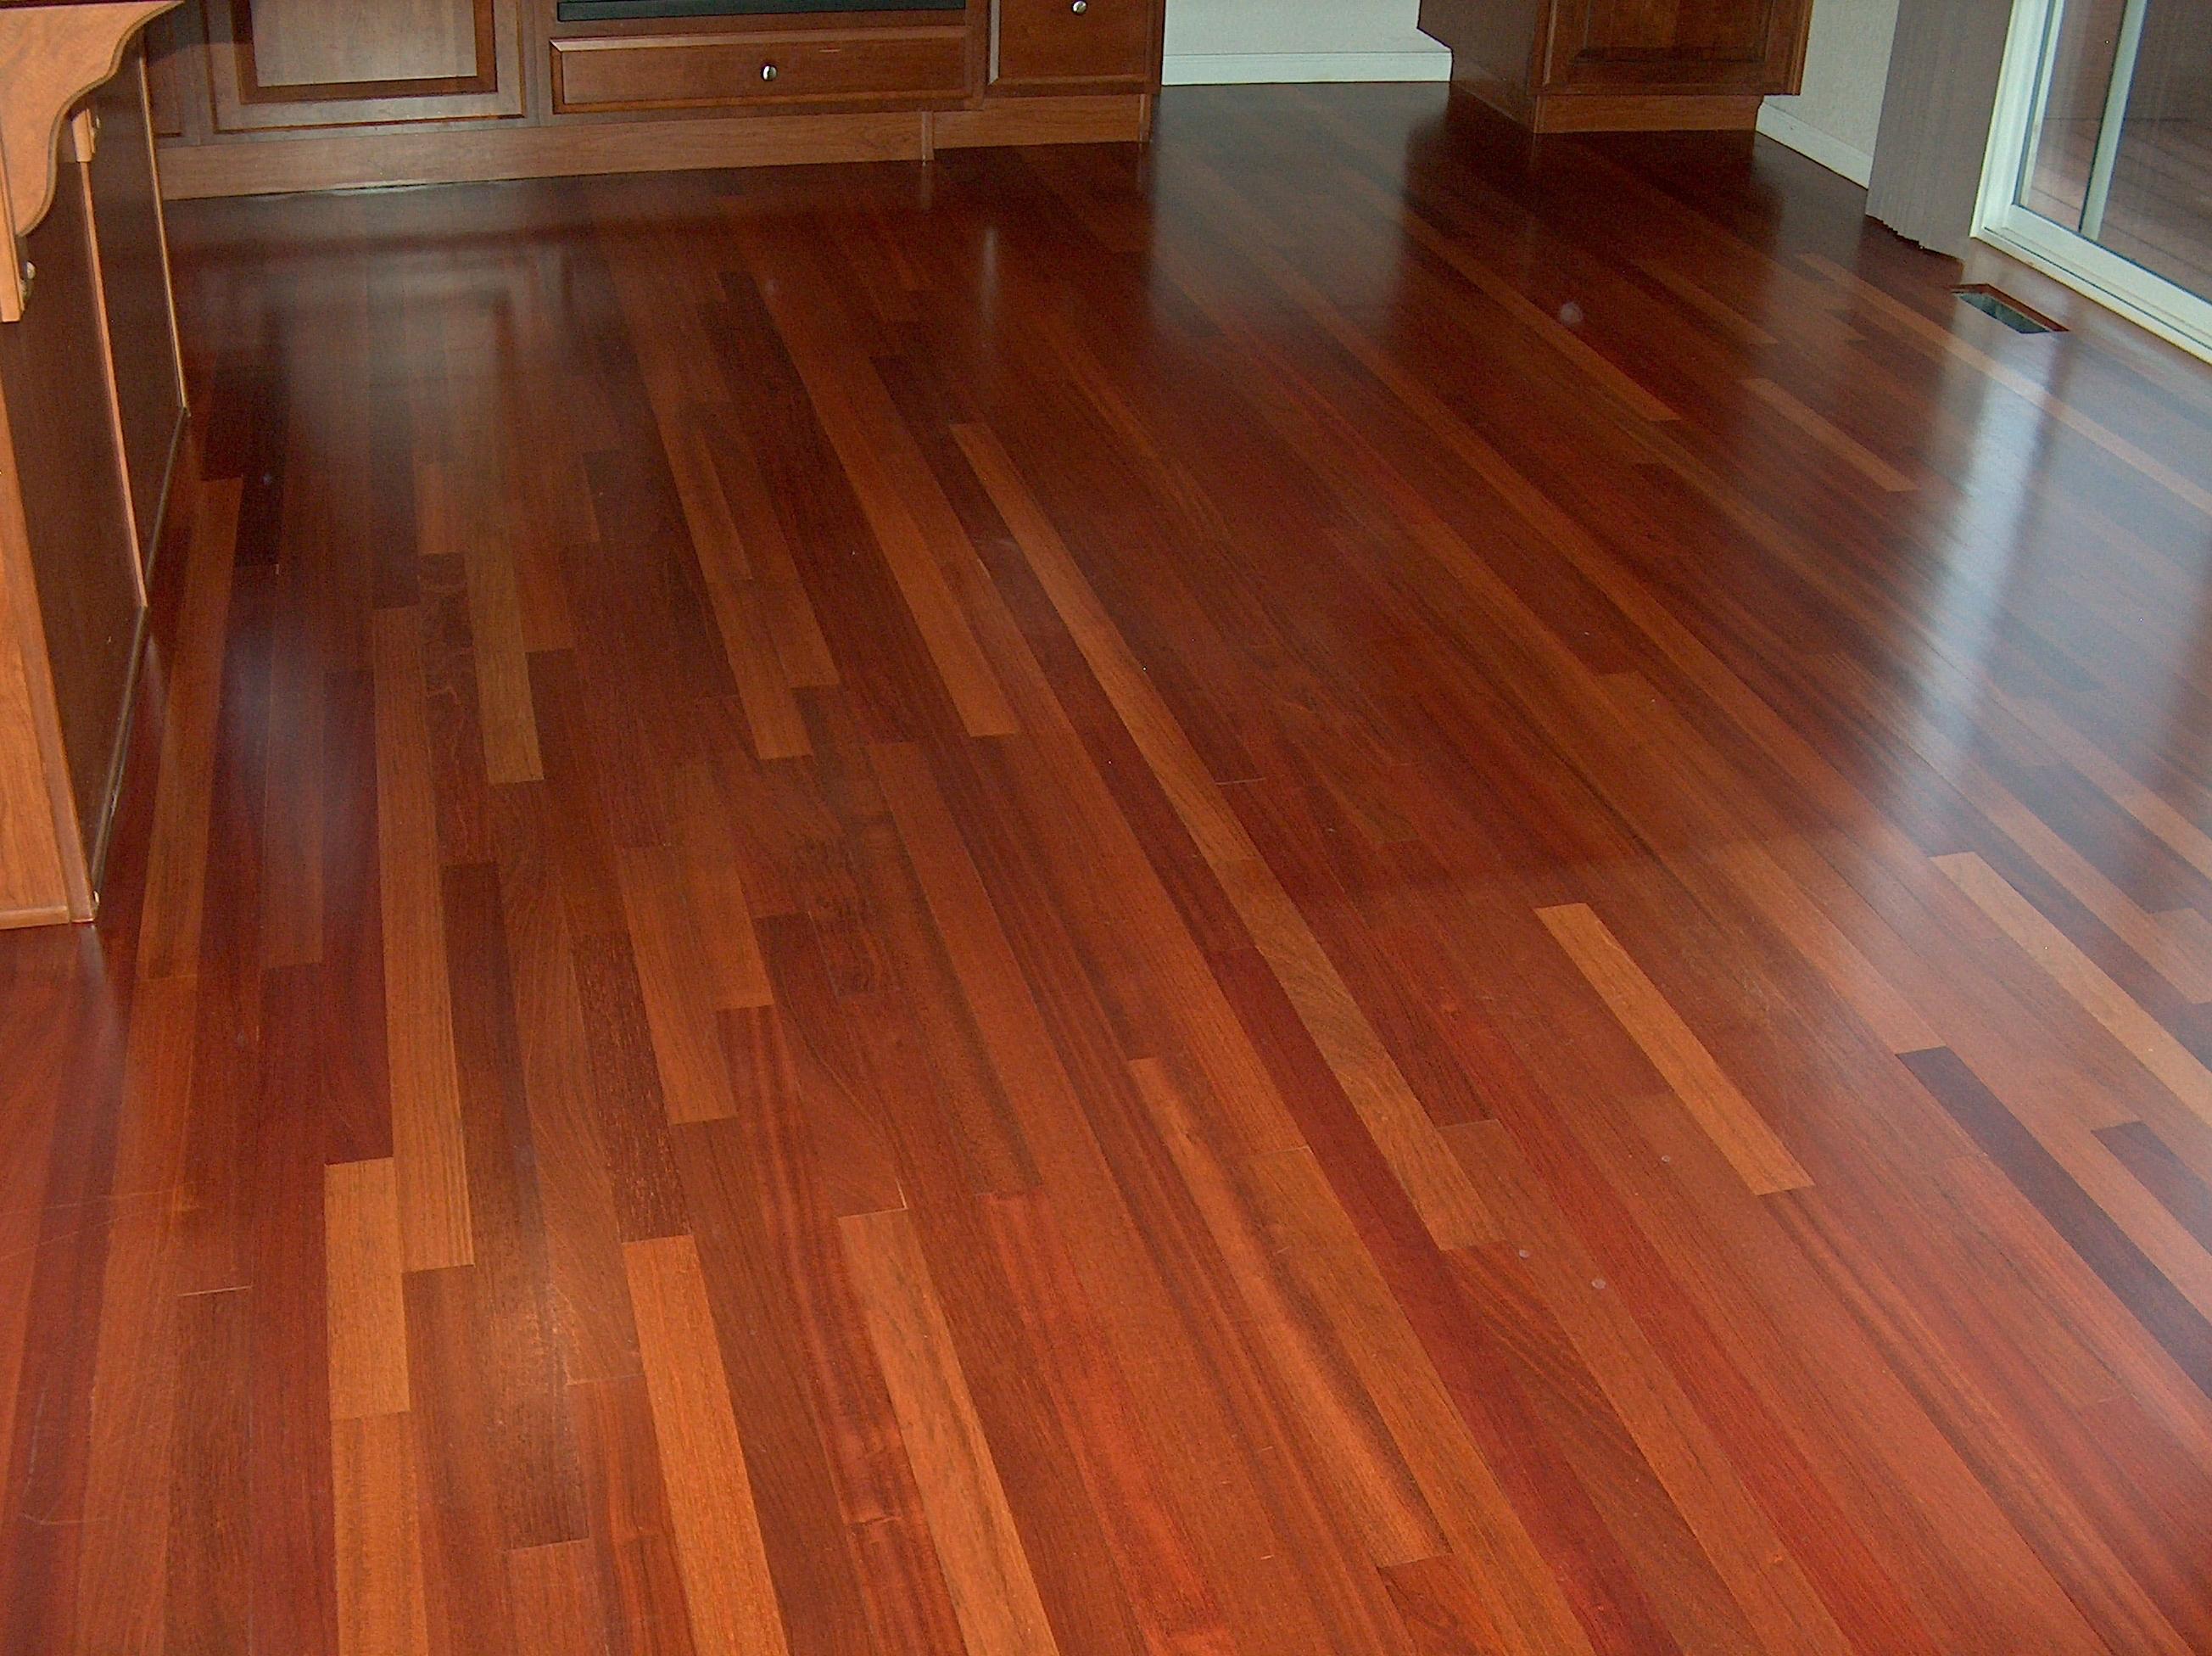 Laminate Flooring Hardwood Baseboard And More In Miami